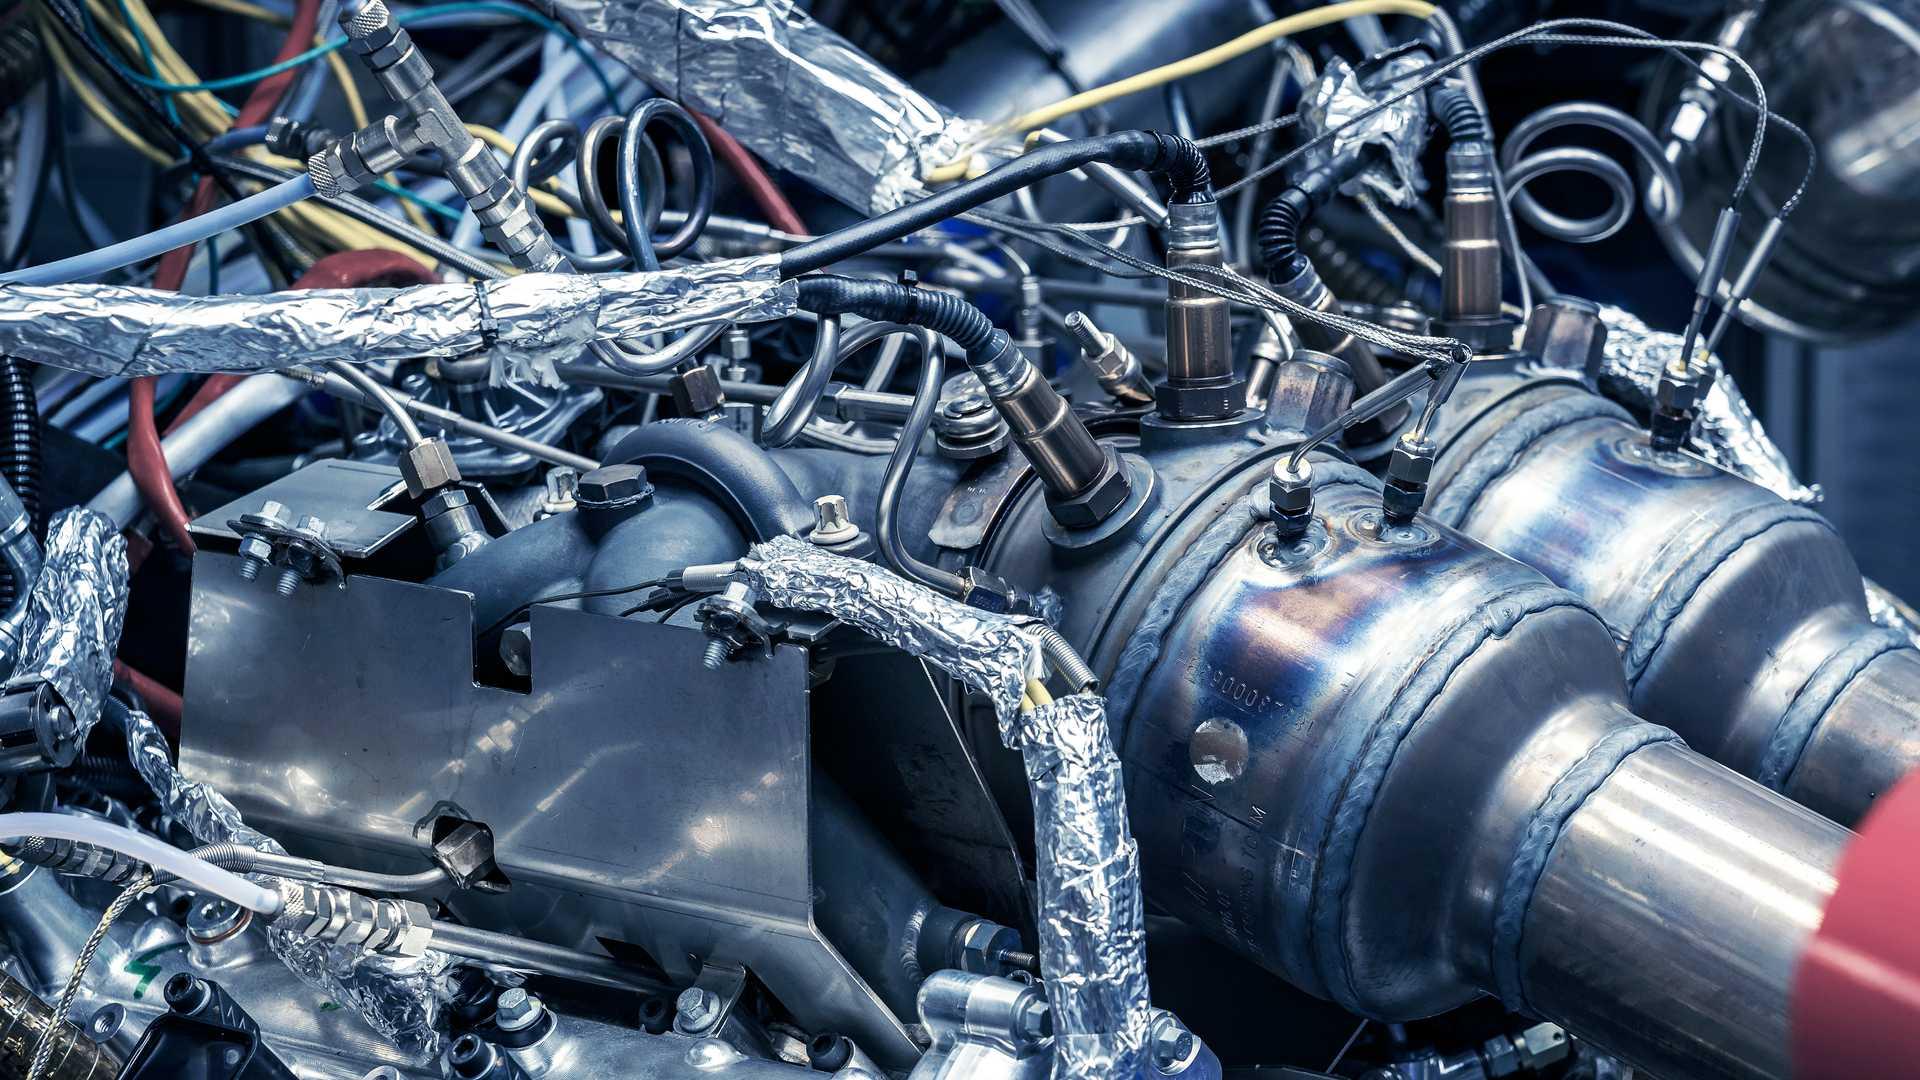 aston-martin-valhalla-tm01-3.0-liter-turbocharged-v6 (4).jpg